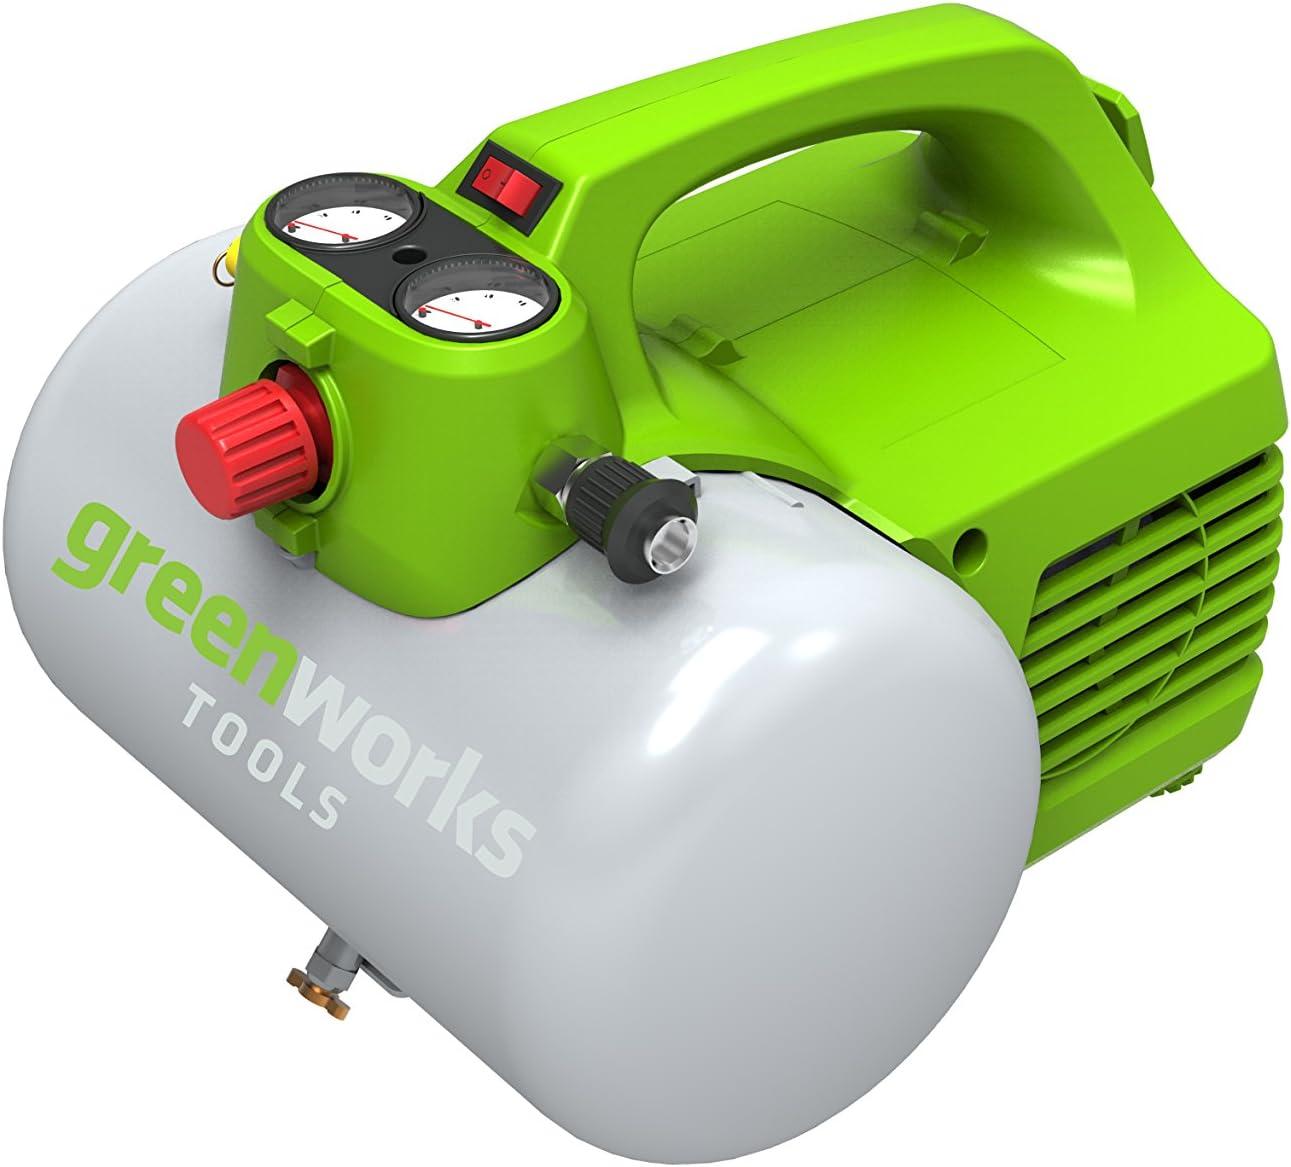 Verde 300 W Greenworks Tools 4101302 Compresor de Aire El/éctrico 230 V